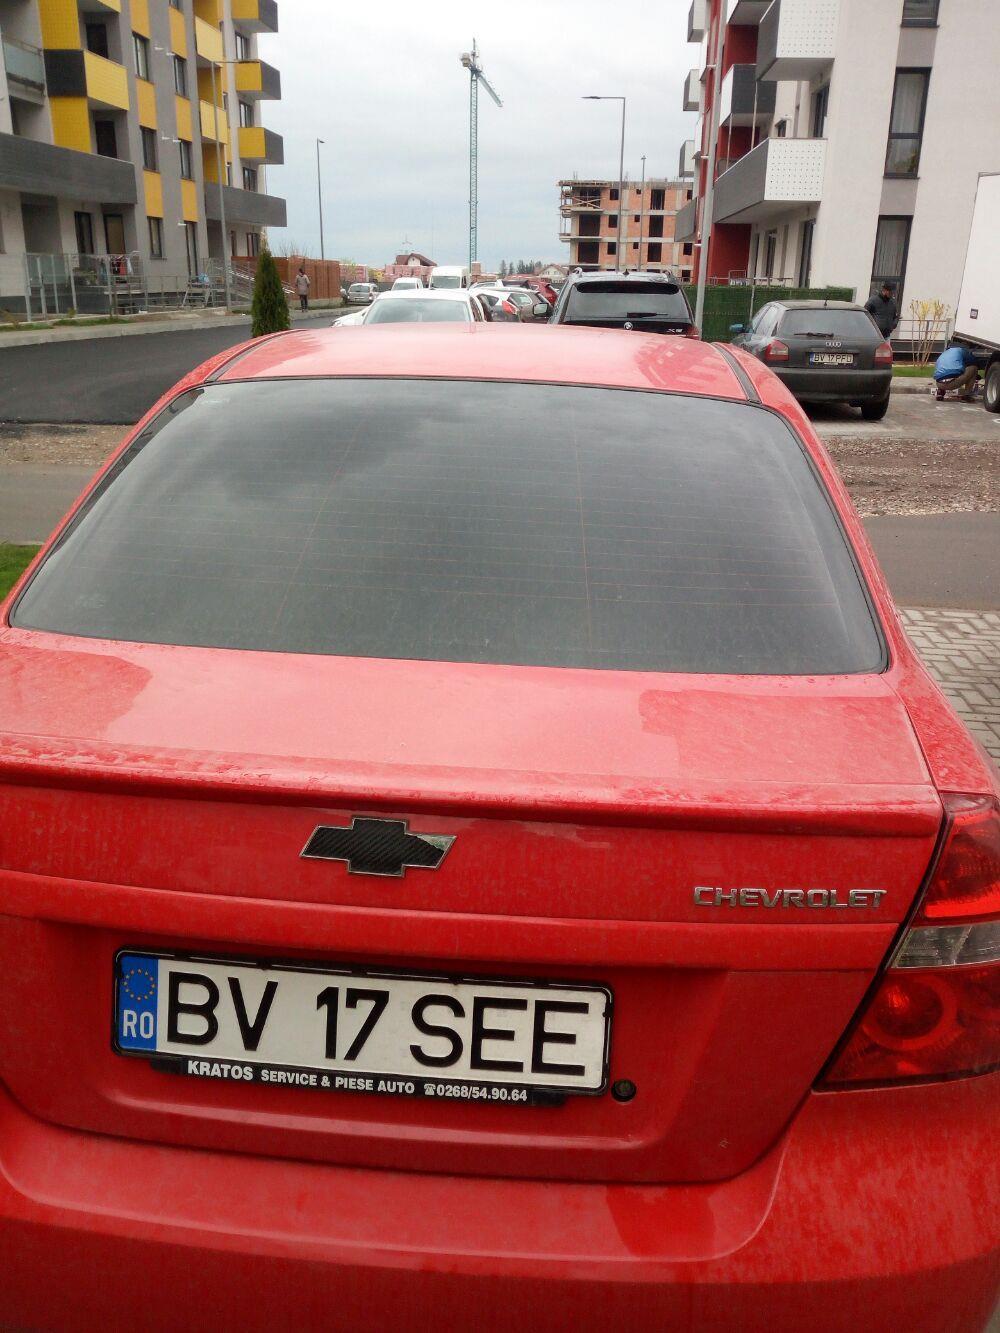 Chevrolet  - imagine 4